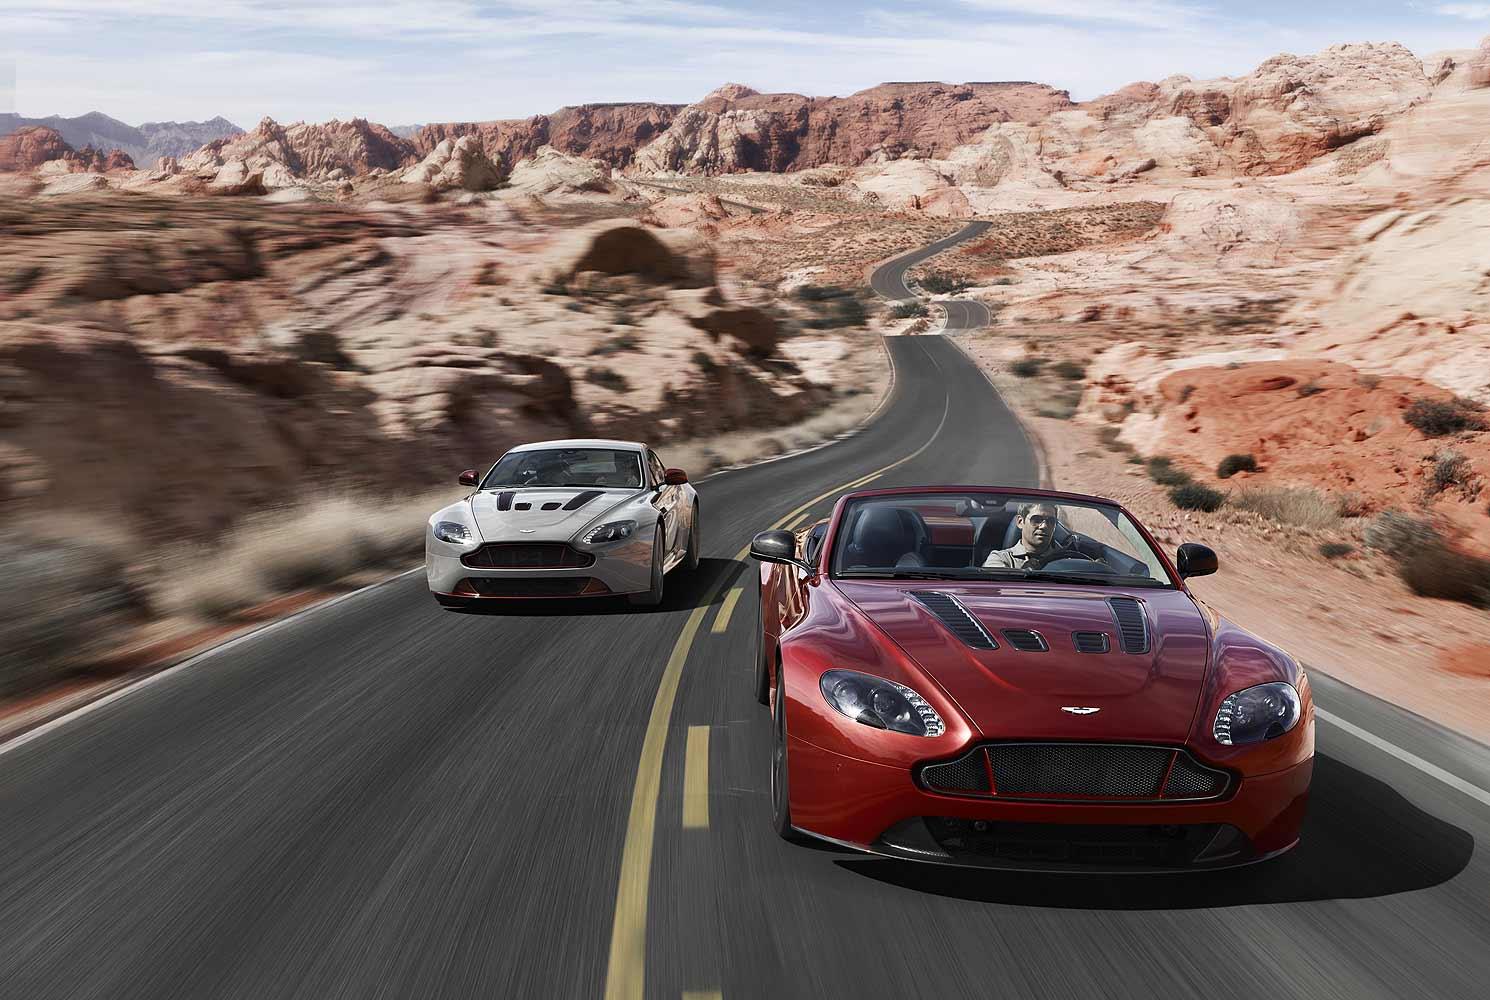 HQ Aston Martin Vantage Roadster Wallpapers   File 162.47Kb